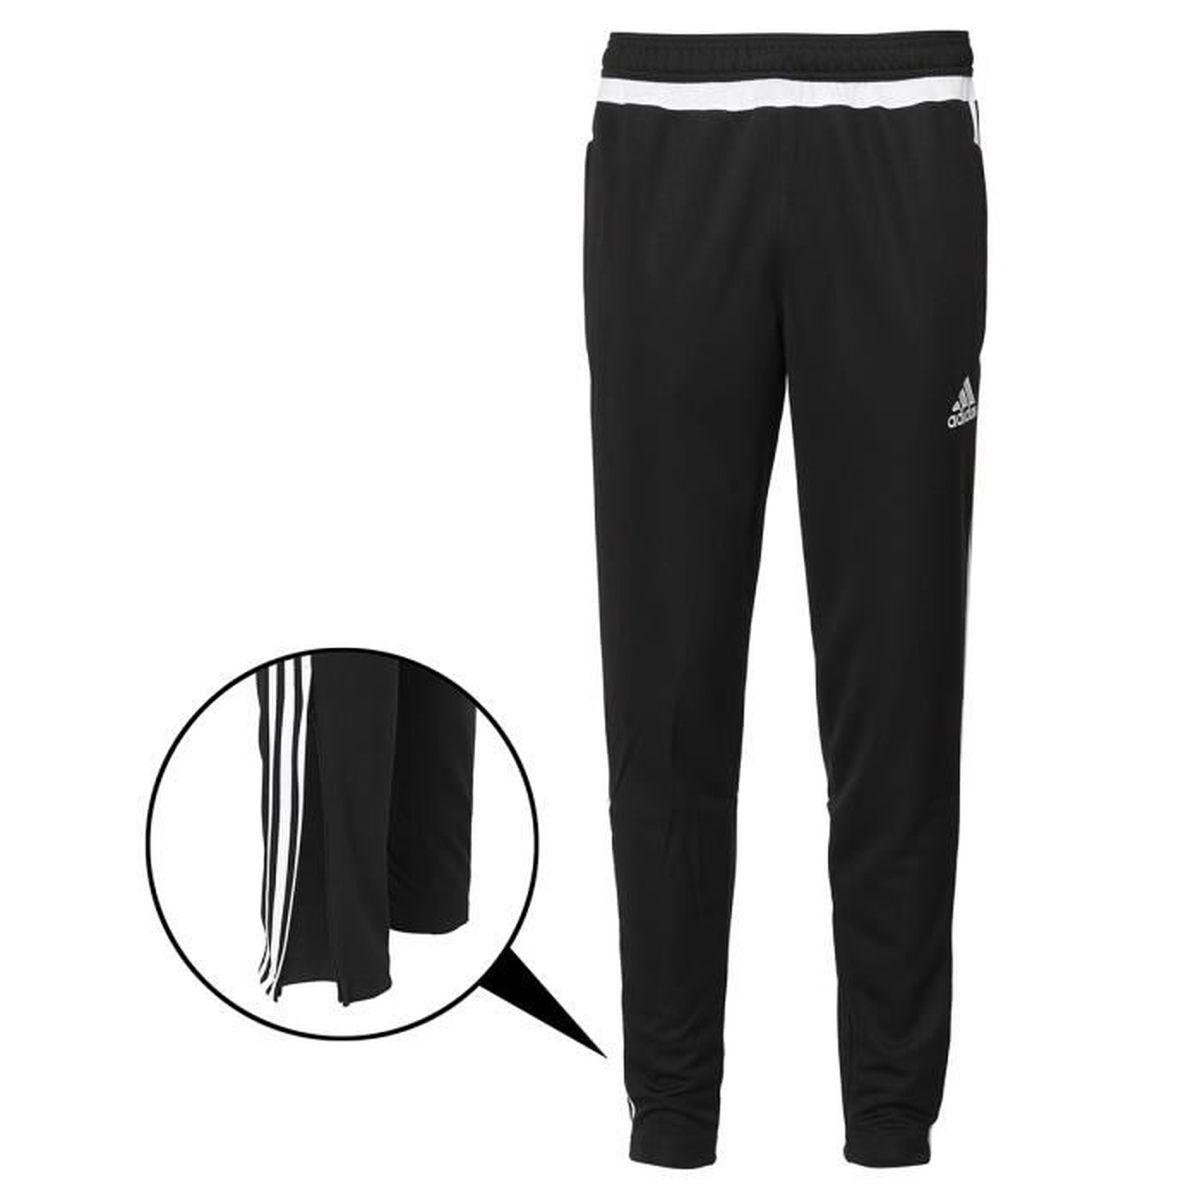 pantalon training adidas homme